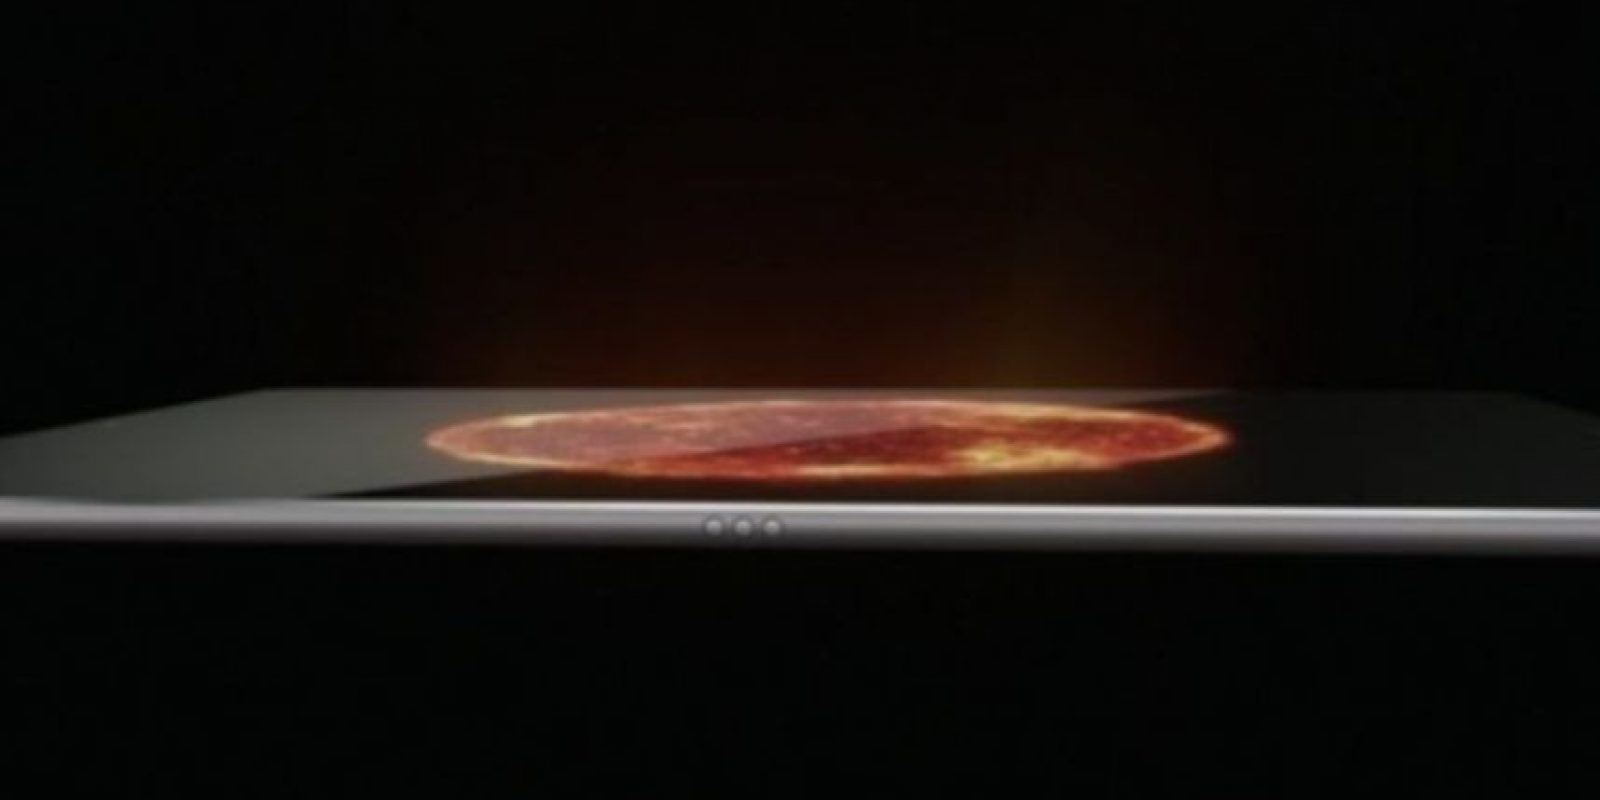 Peso modelo Wi-Fi: 713 gramos (1.57 libras). Foto:Apple